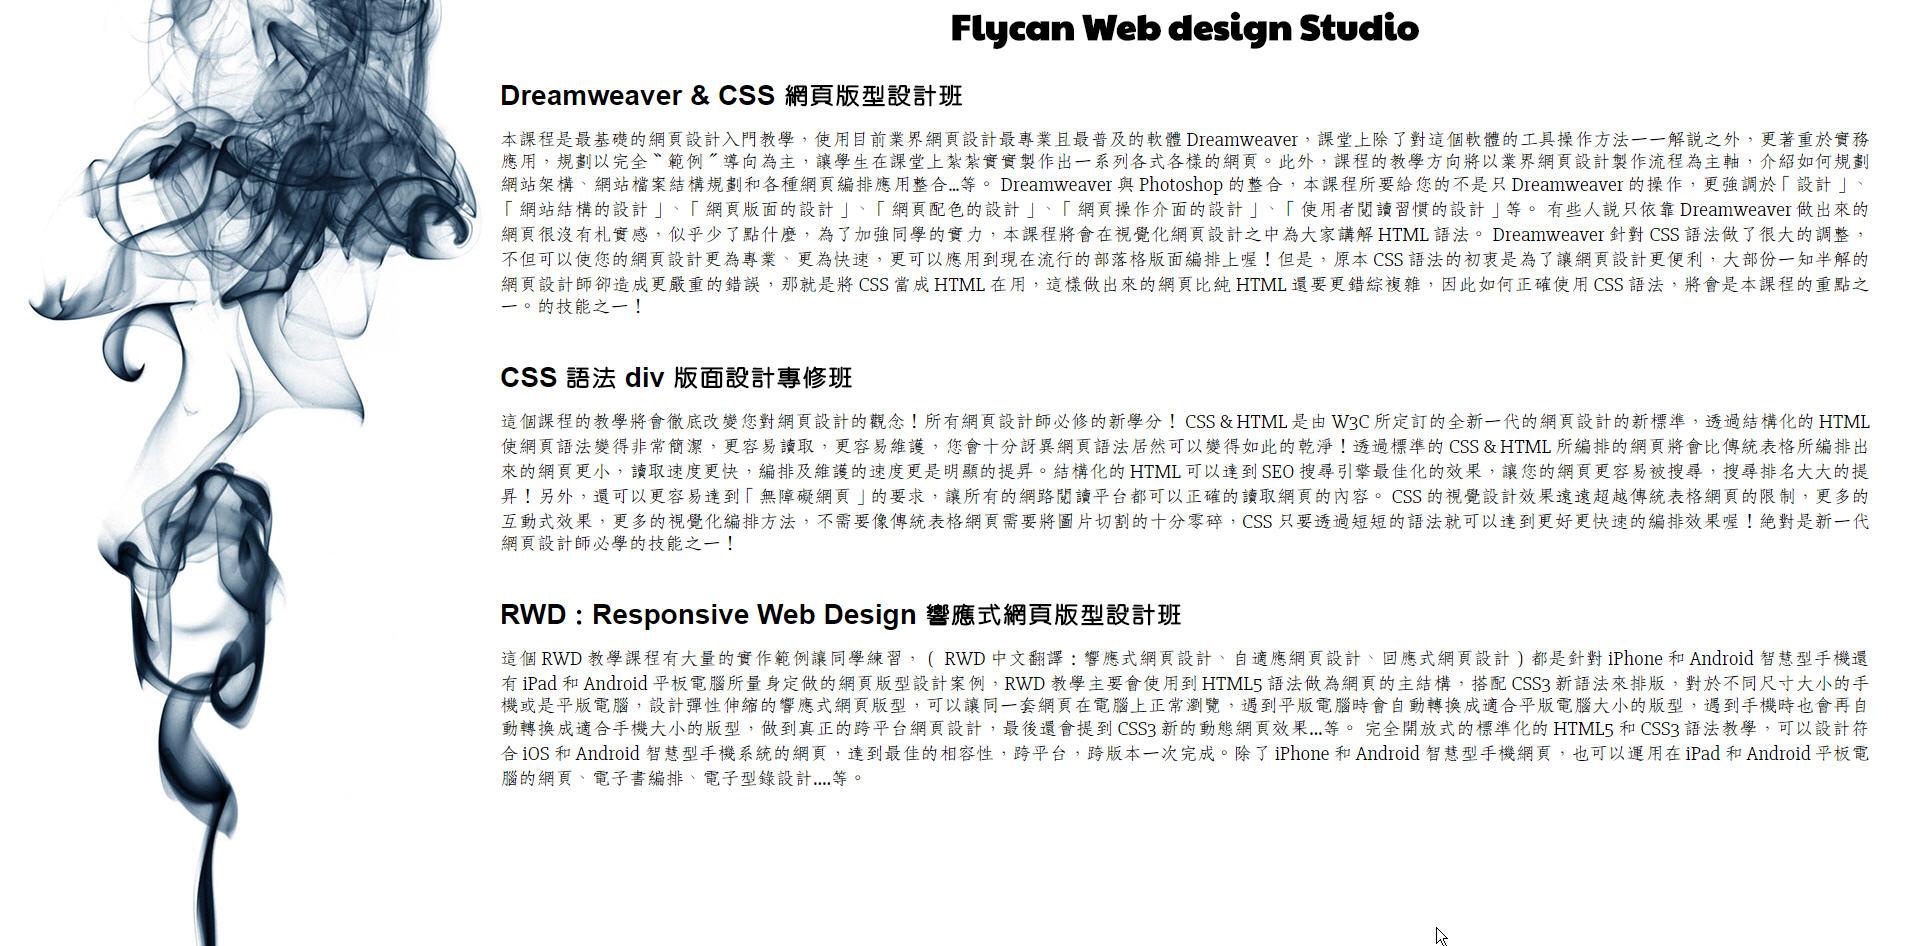 CSS 語法 - 網頁設計 Free Resource 好康報報 Good Design 好站報報  - 【設計資源】 - Google Fonts 免費雲端字庫-實作篇 - okok-2